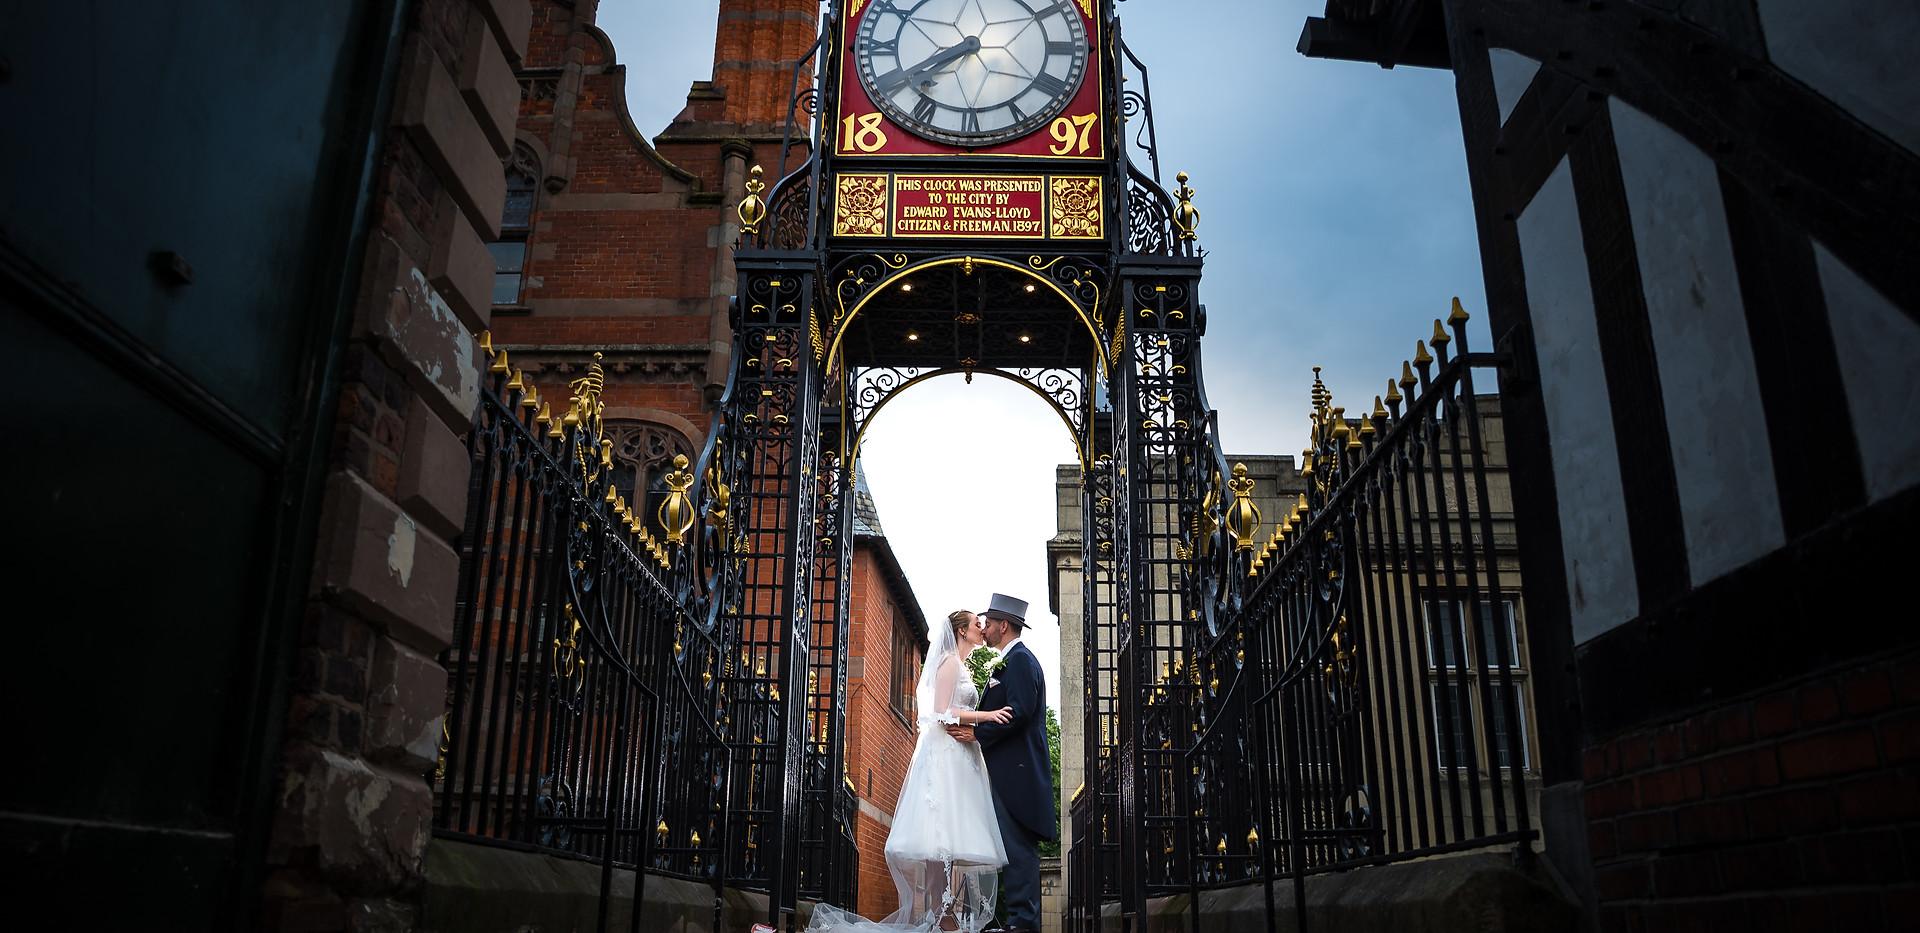 Oddfellows Wedding Photography___38.jpg